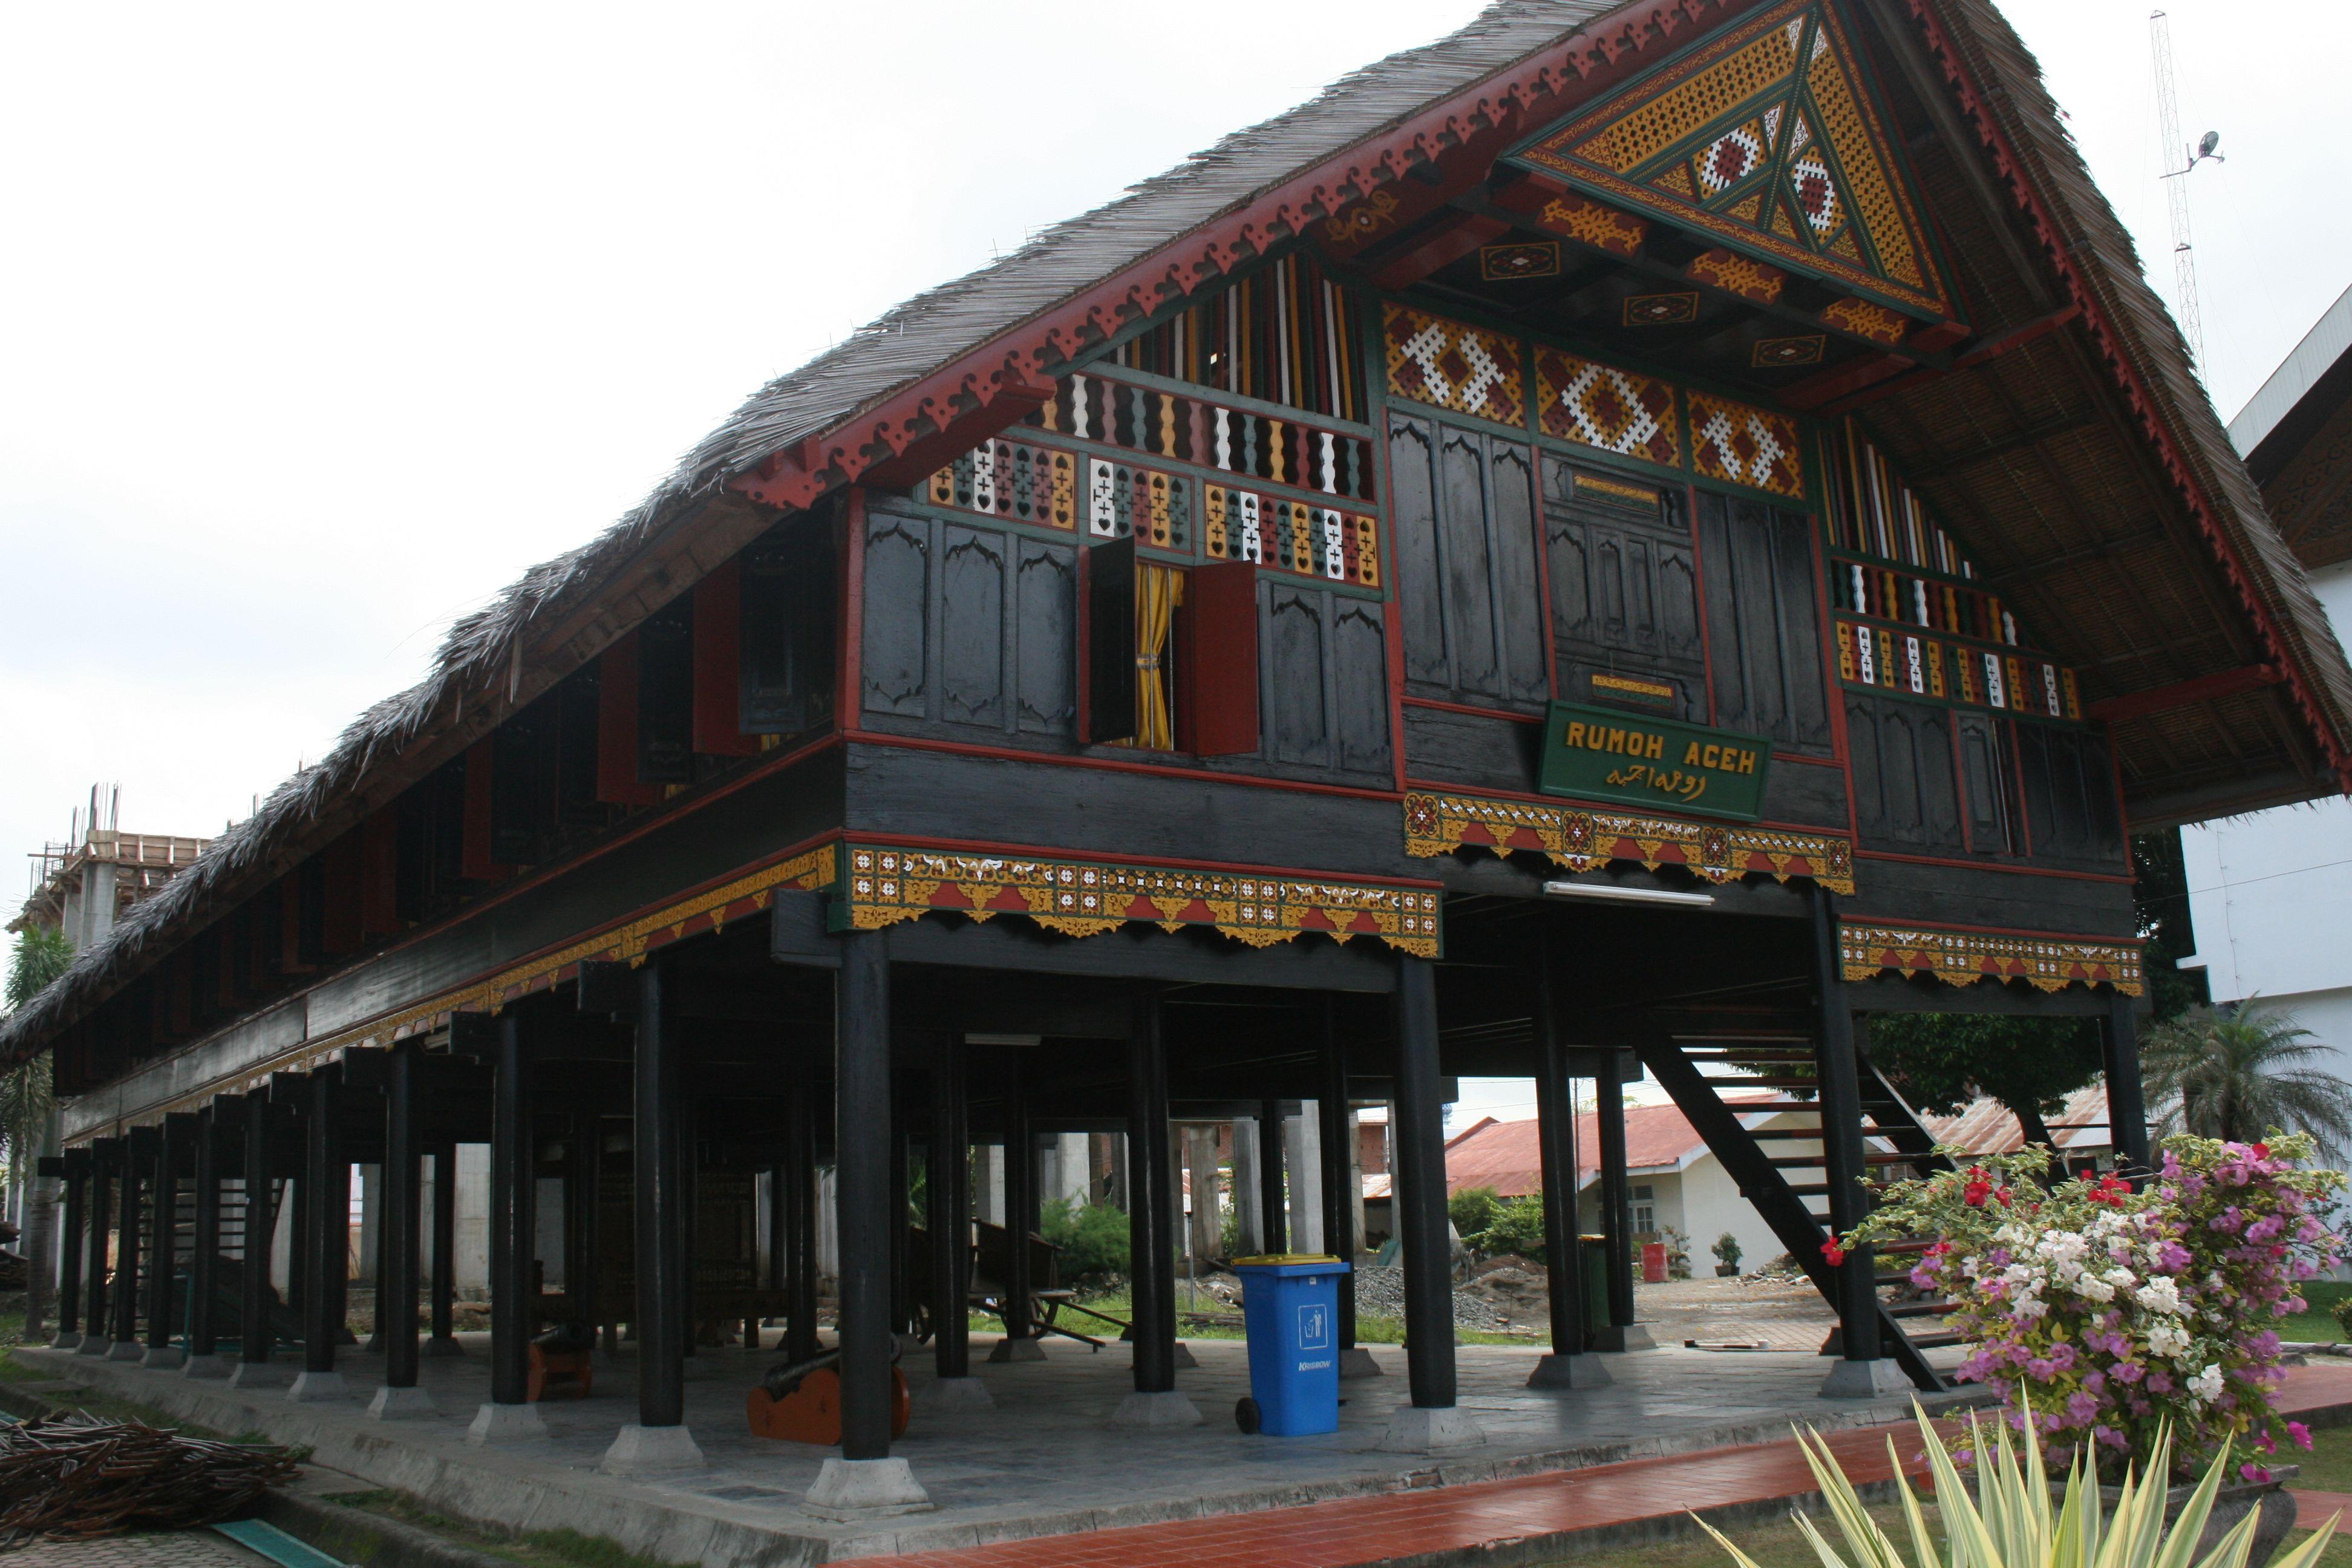 Rumah Adat Pulau Sulawesi